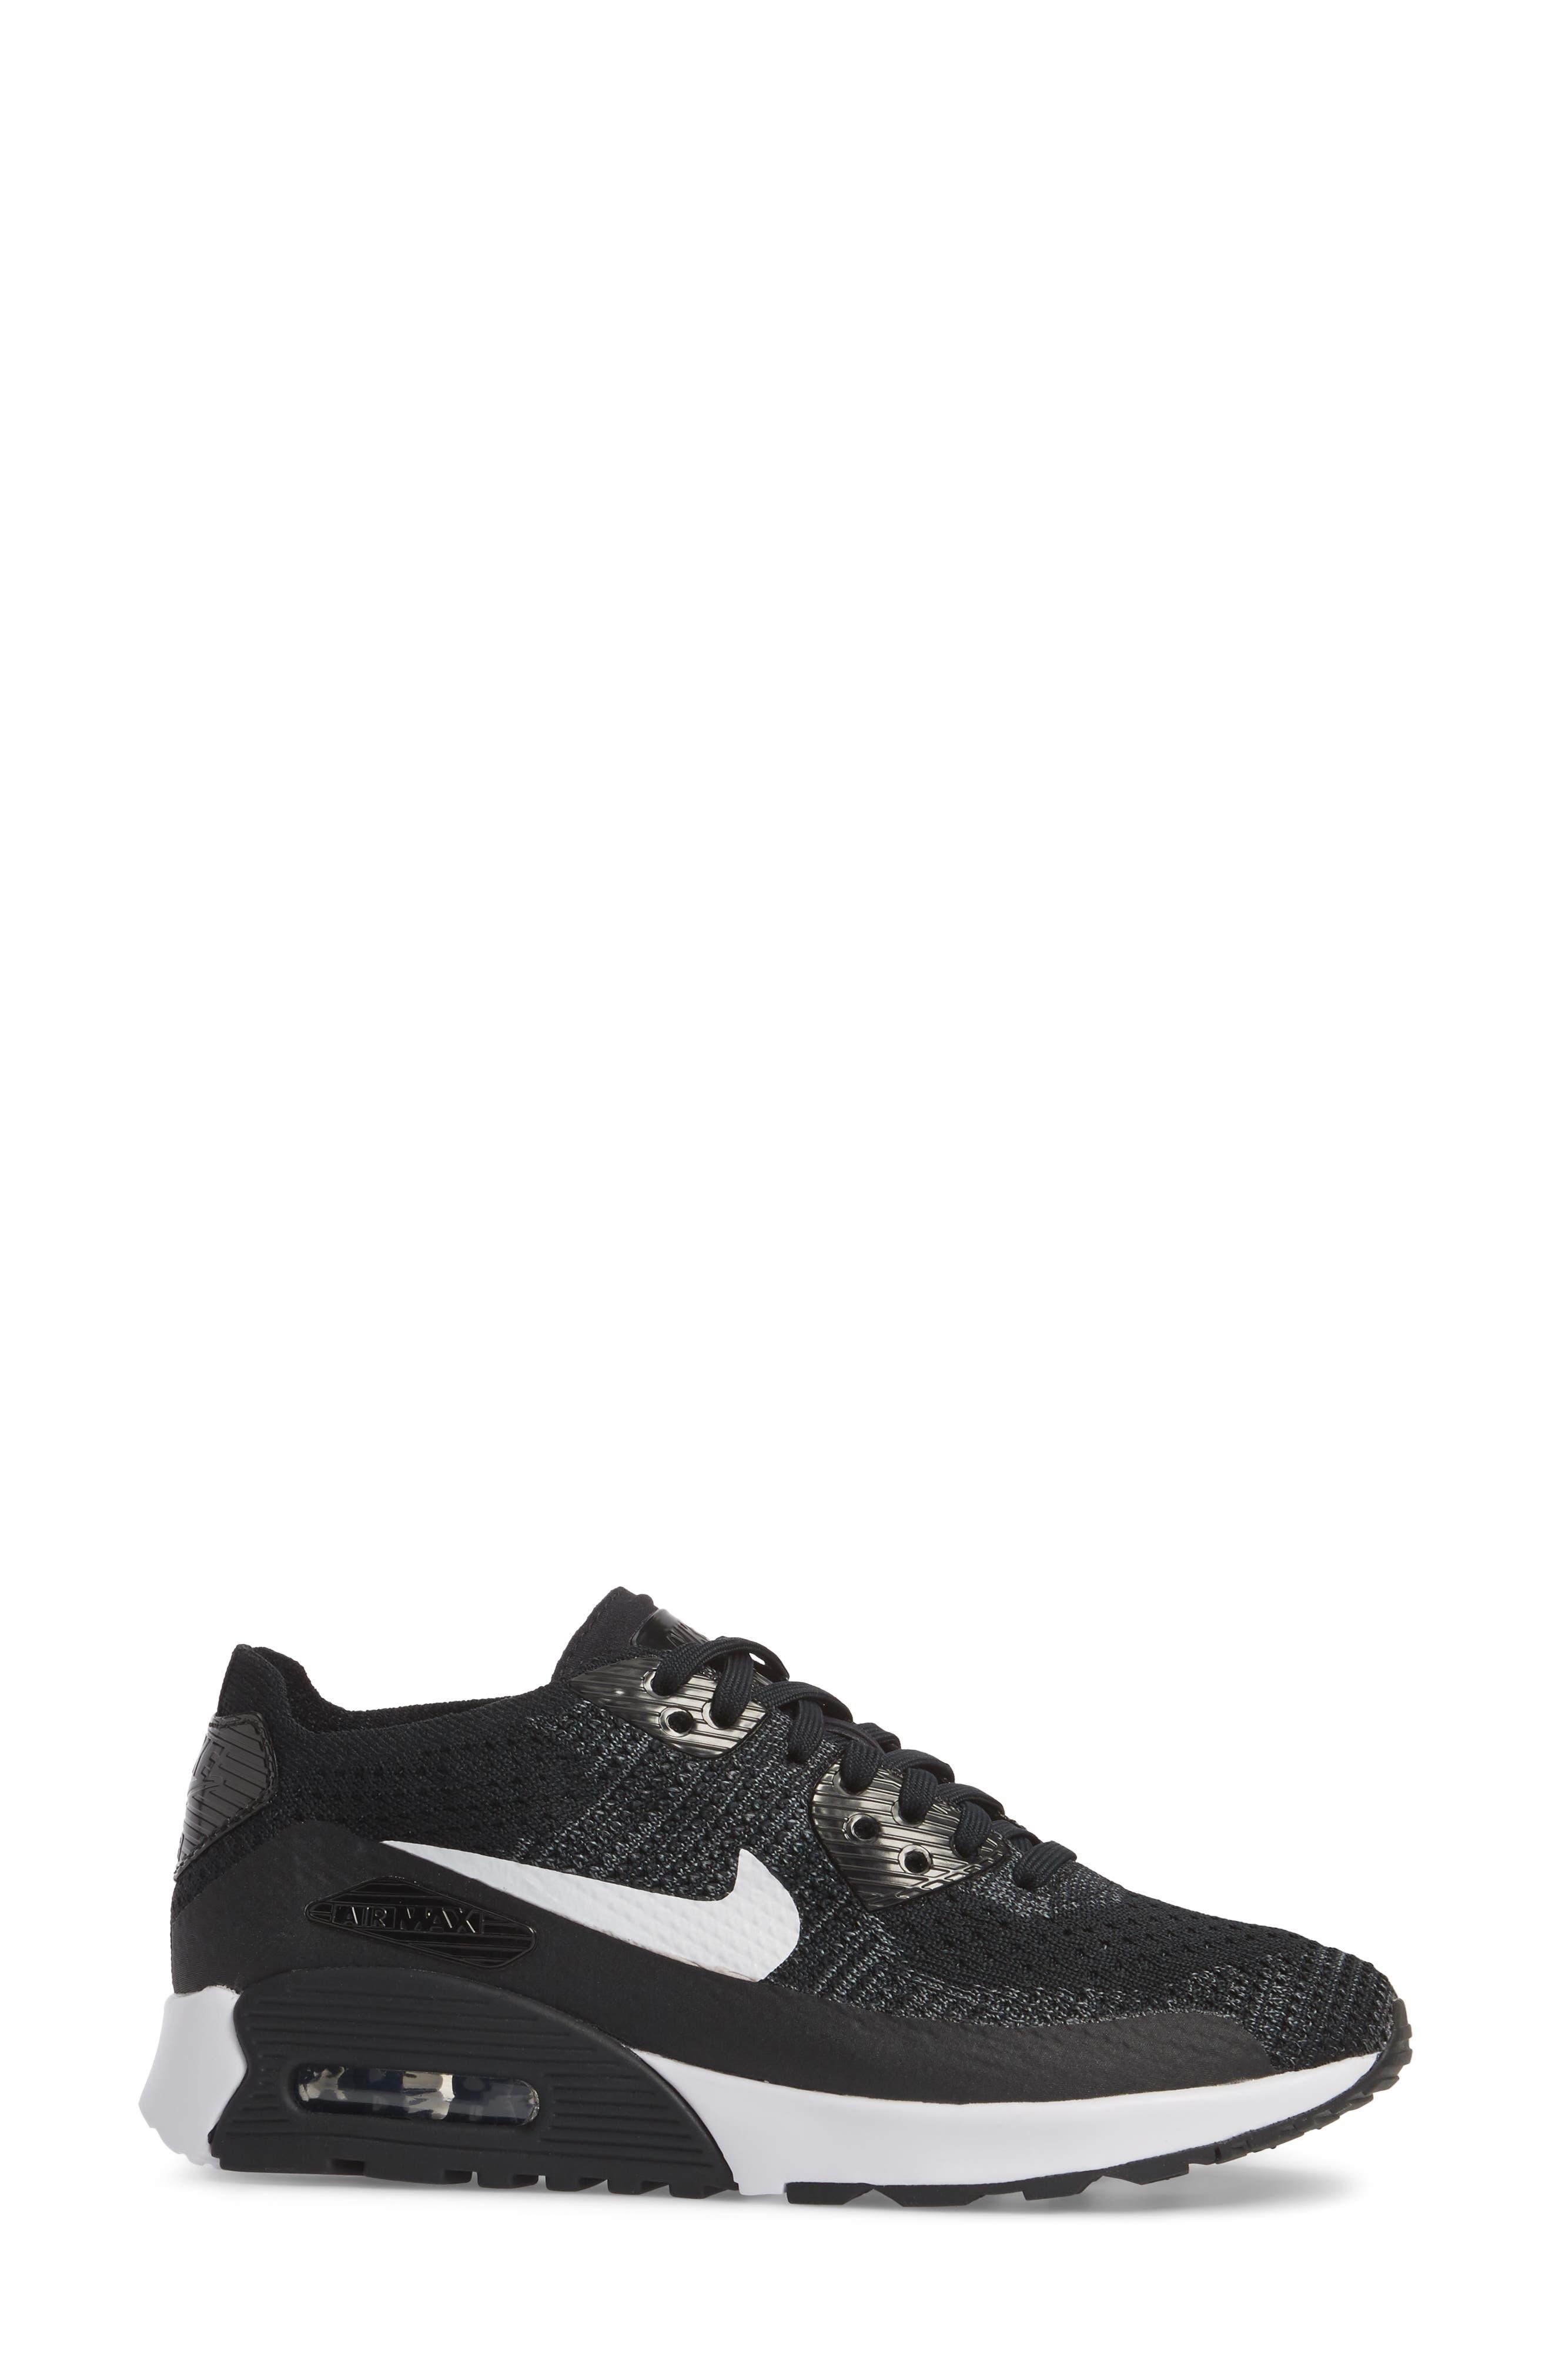 NIKE,                             Air Max 90 Flyknit Ultra 2.0 Sneaker,                             Alternate thumbnail 3, color,                             004